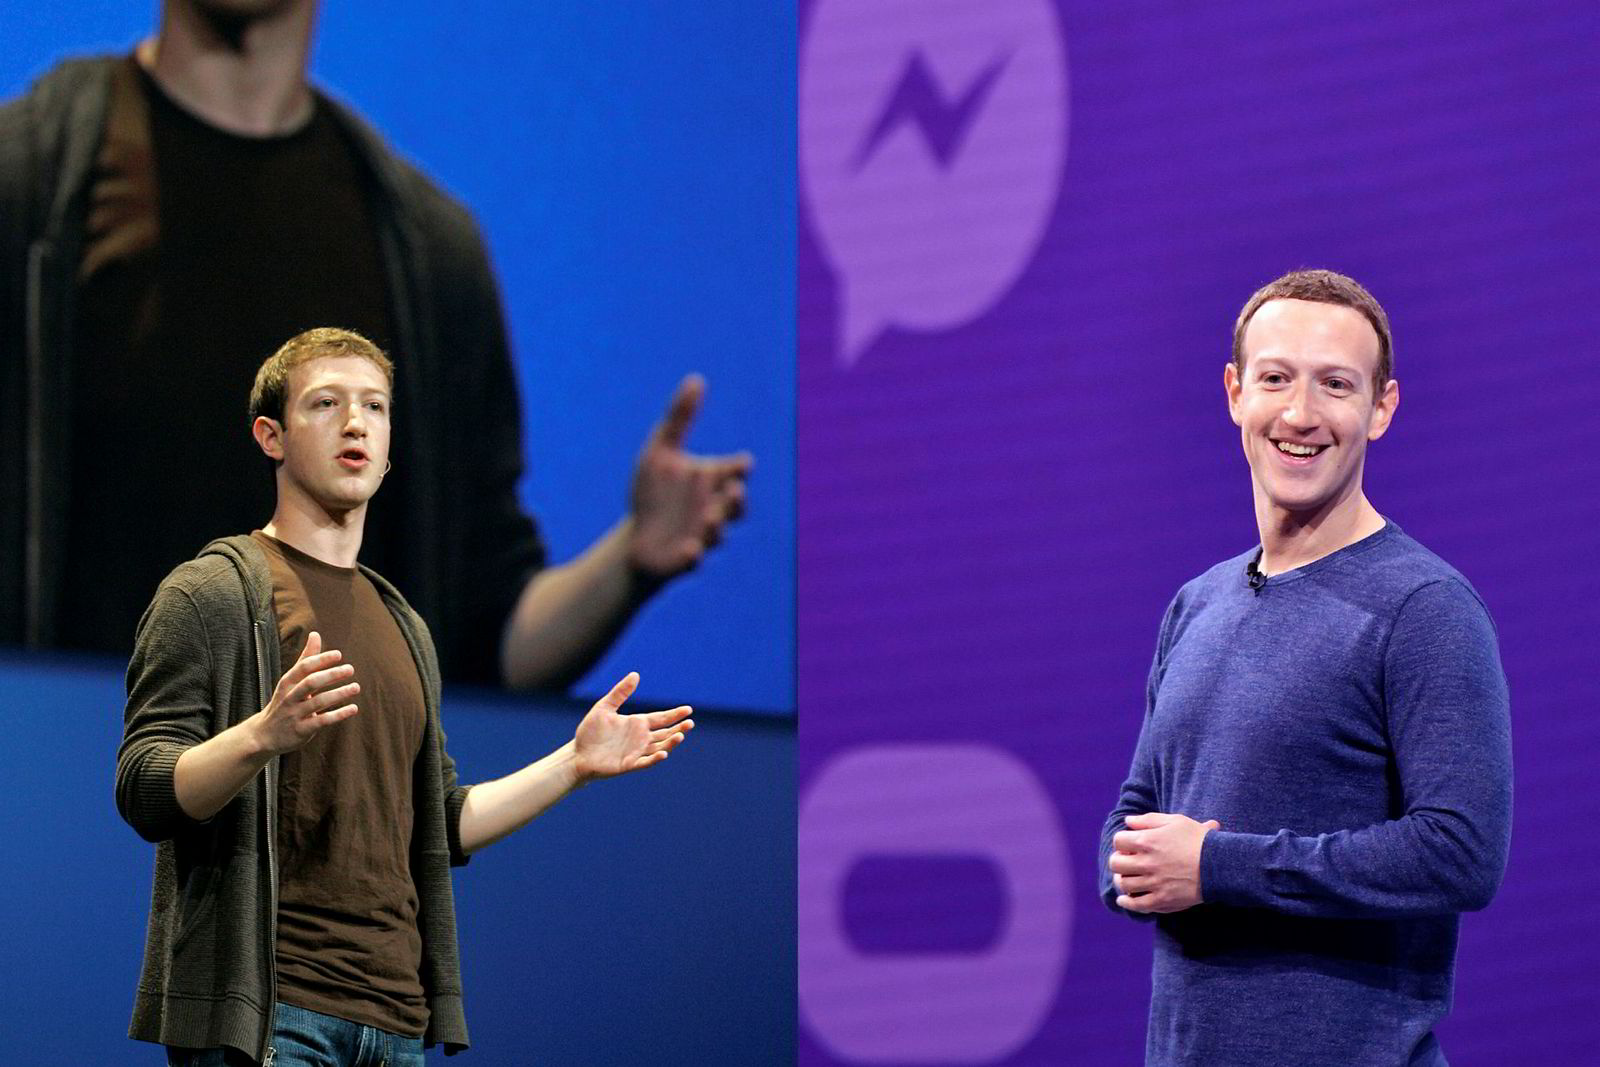 #10yearchallenge: Facebook-sjef Mark Zuckerberg i 2008 og 2018.